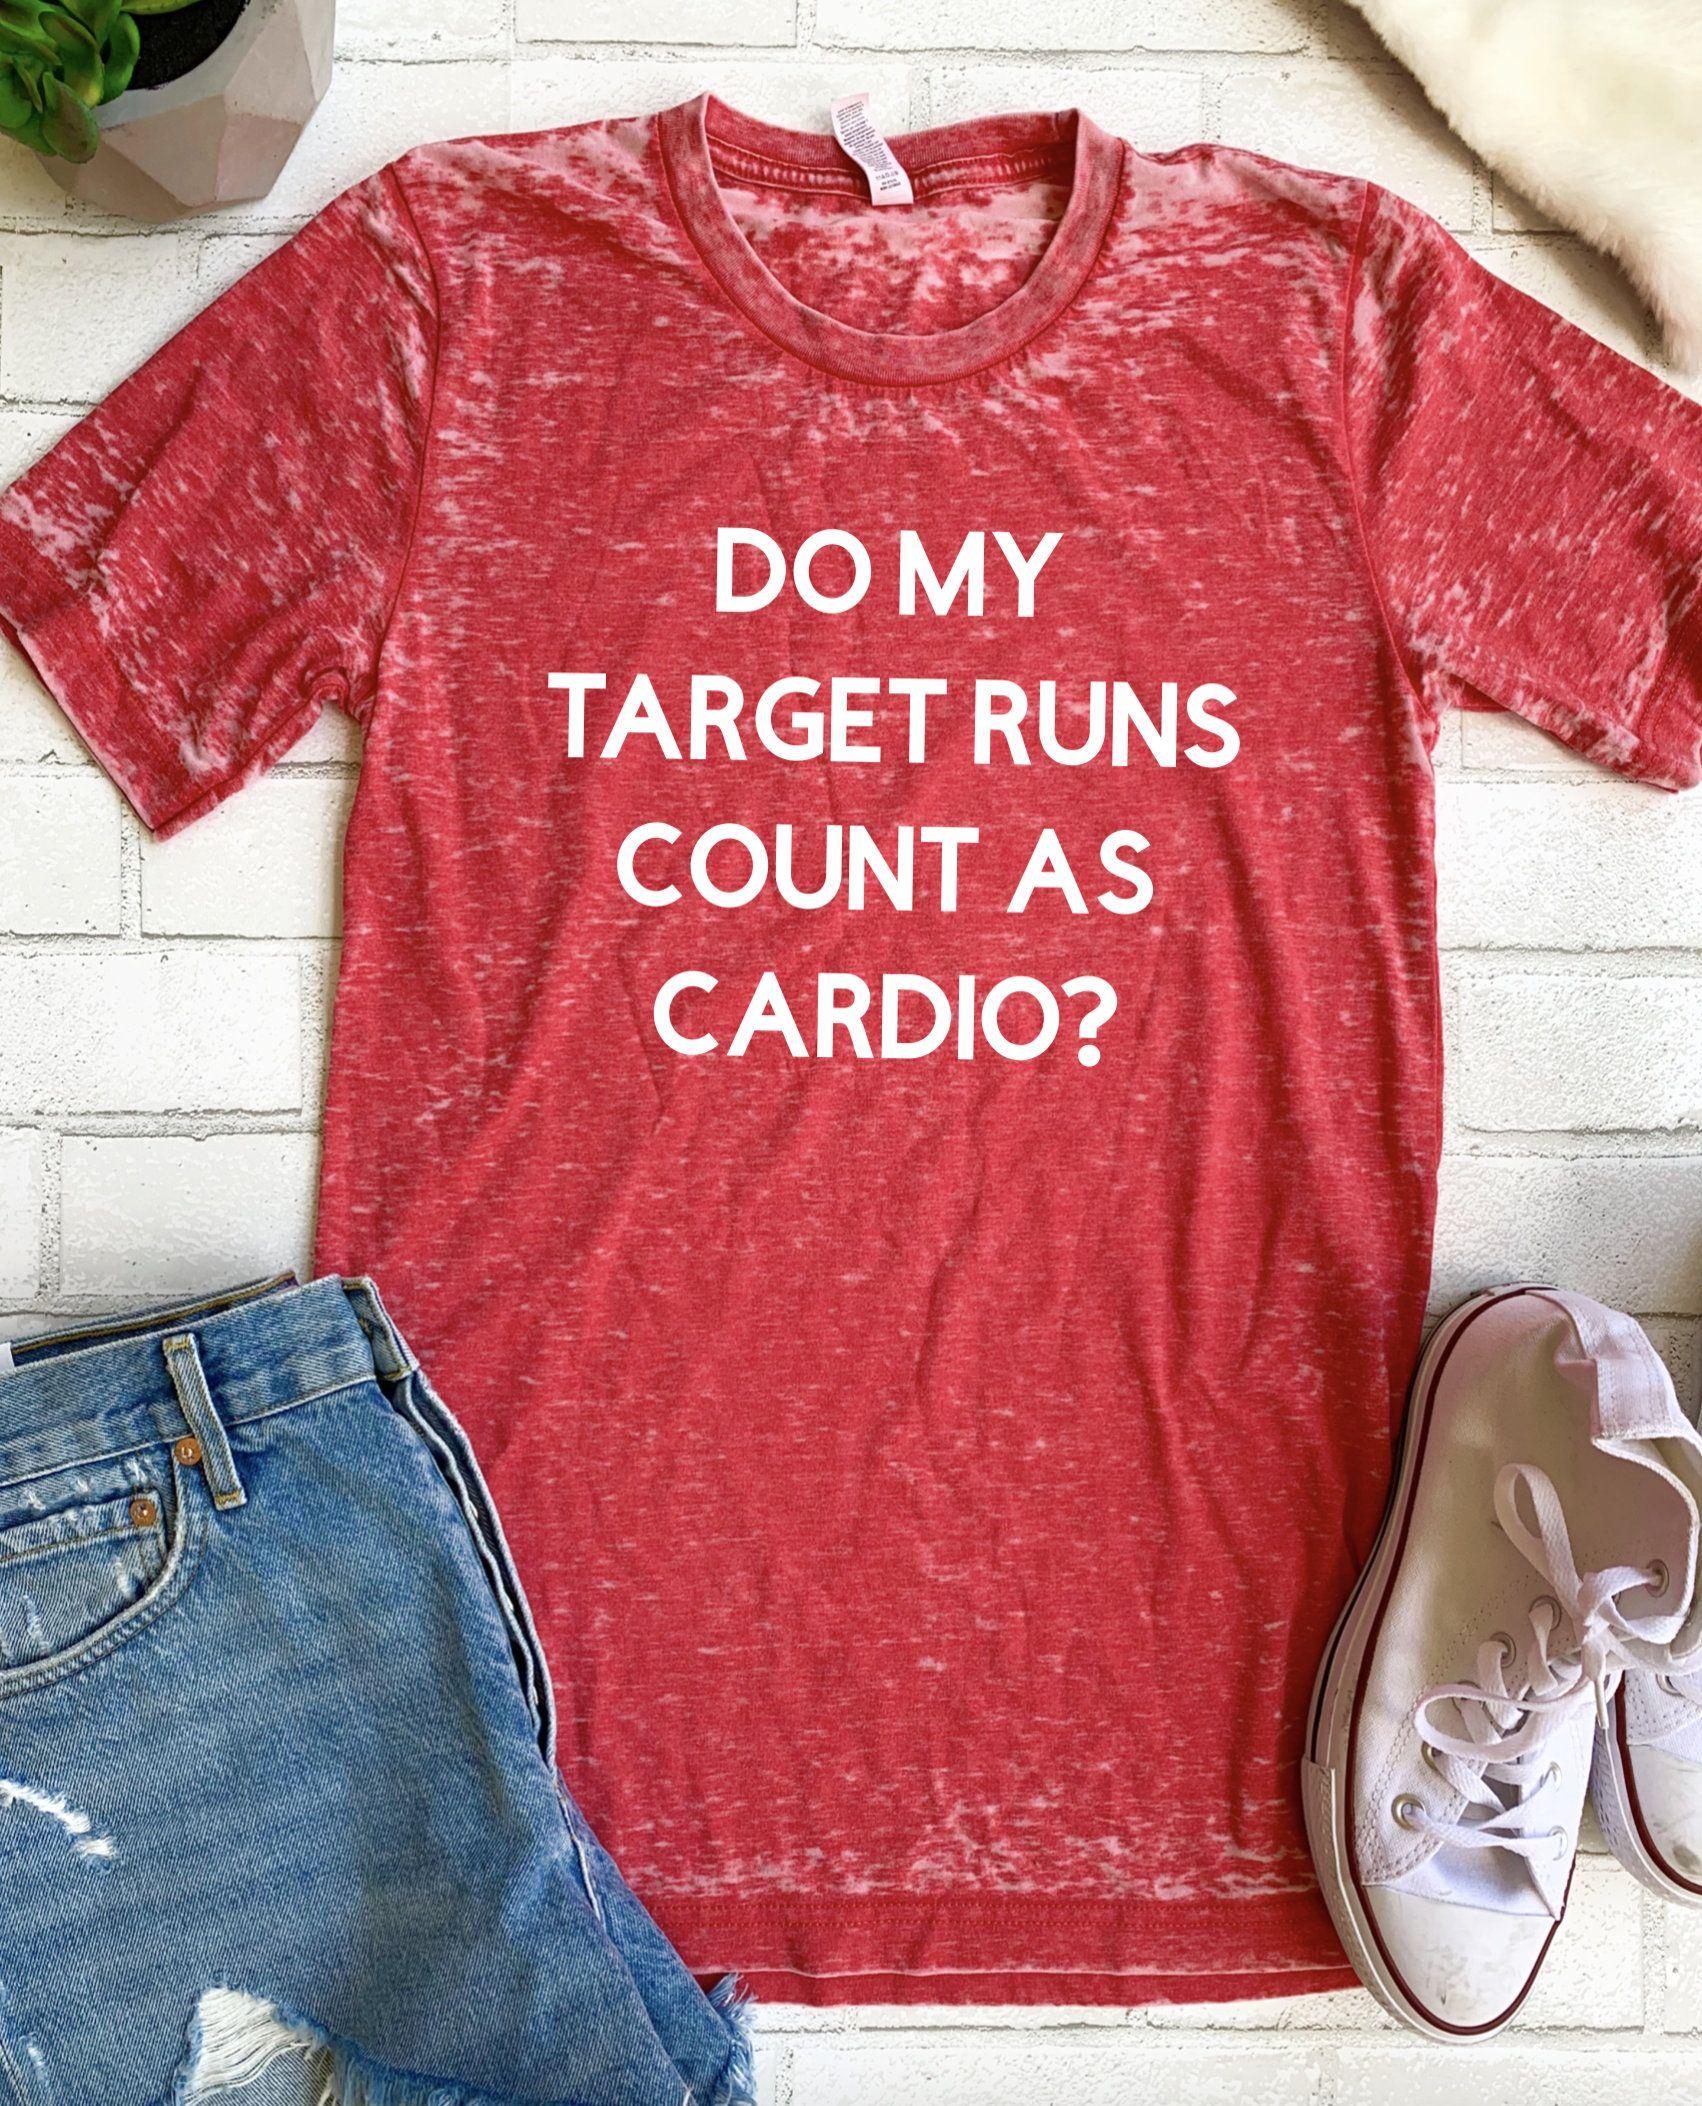 Target Cardio Sweatshirt Target Sweatshirt Target And Starbucks Mom Sweatshirt Mom Gift Target Runs Sister G Disney Mom Shirt Game Day Shirts Sweatshirts [ 2106 x 1702 Pixel ]